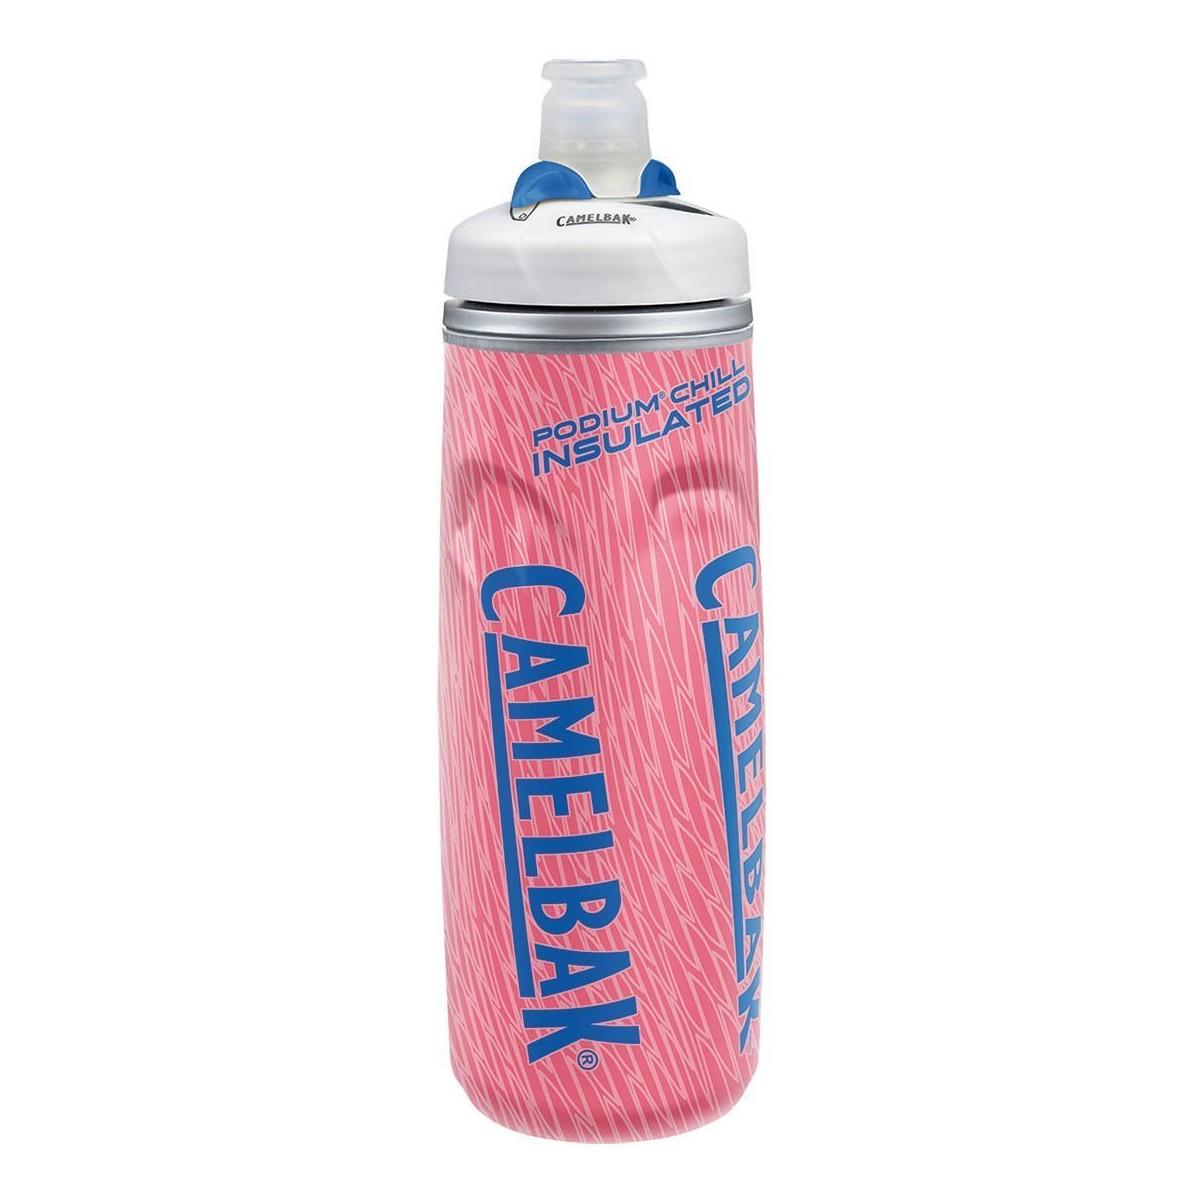 8702f754b8 Camelbak Podium Chill 620ml/21oz insulated water bottle gym bag ...